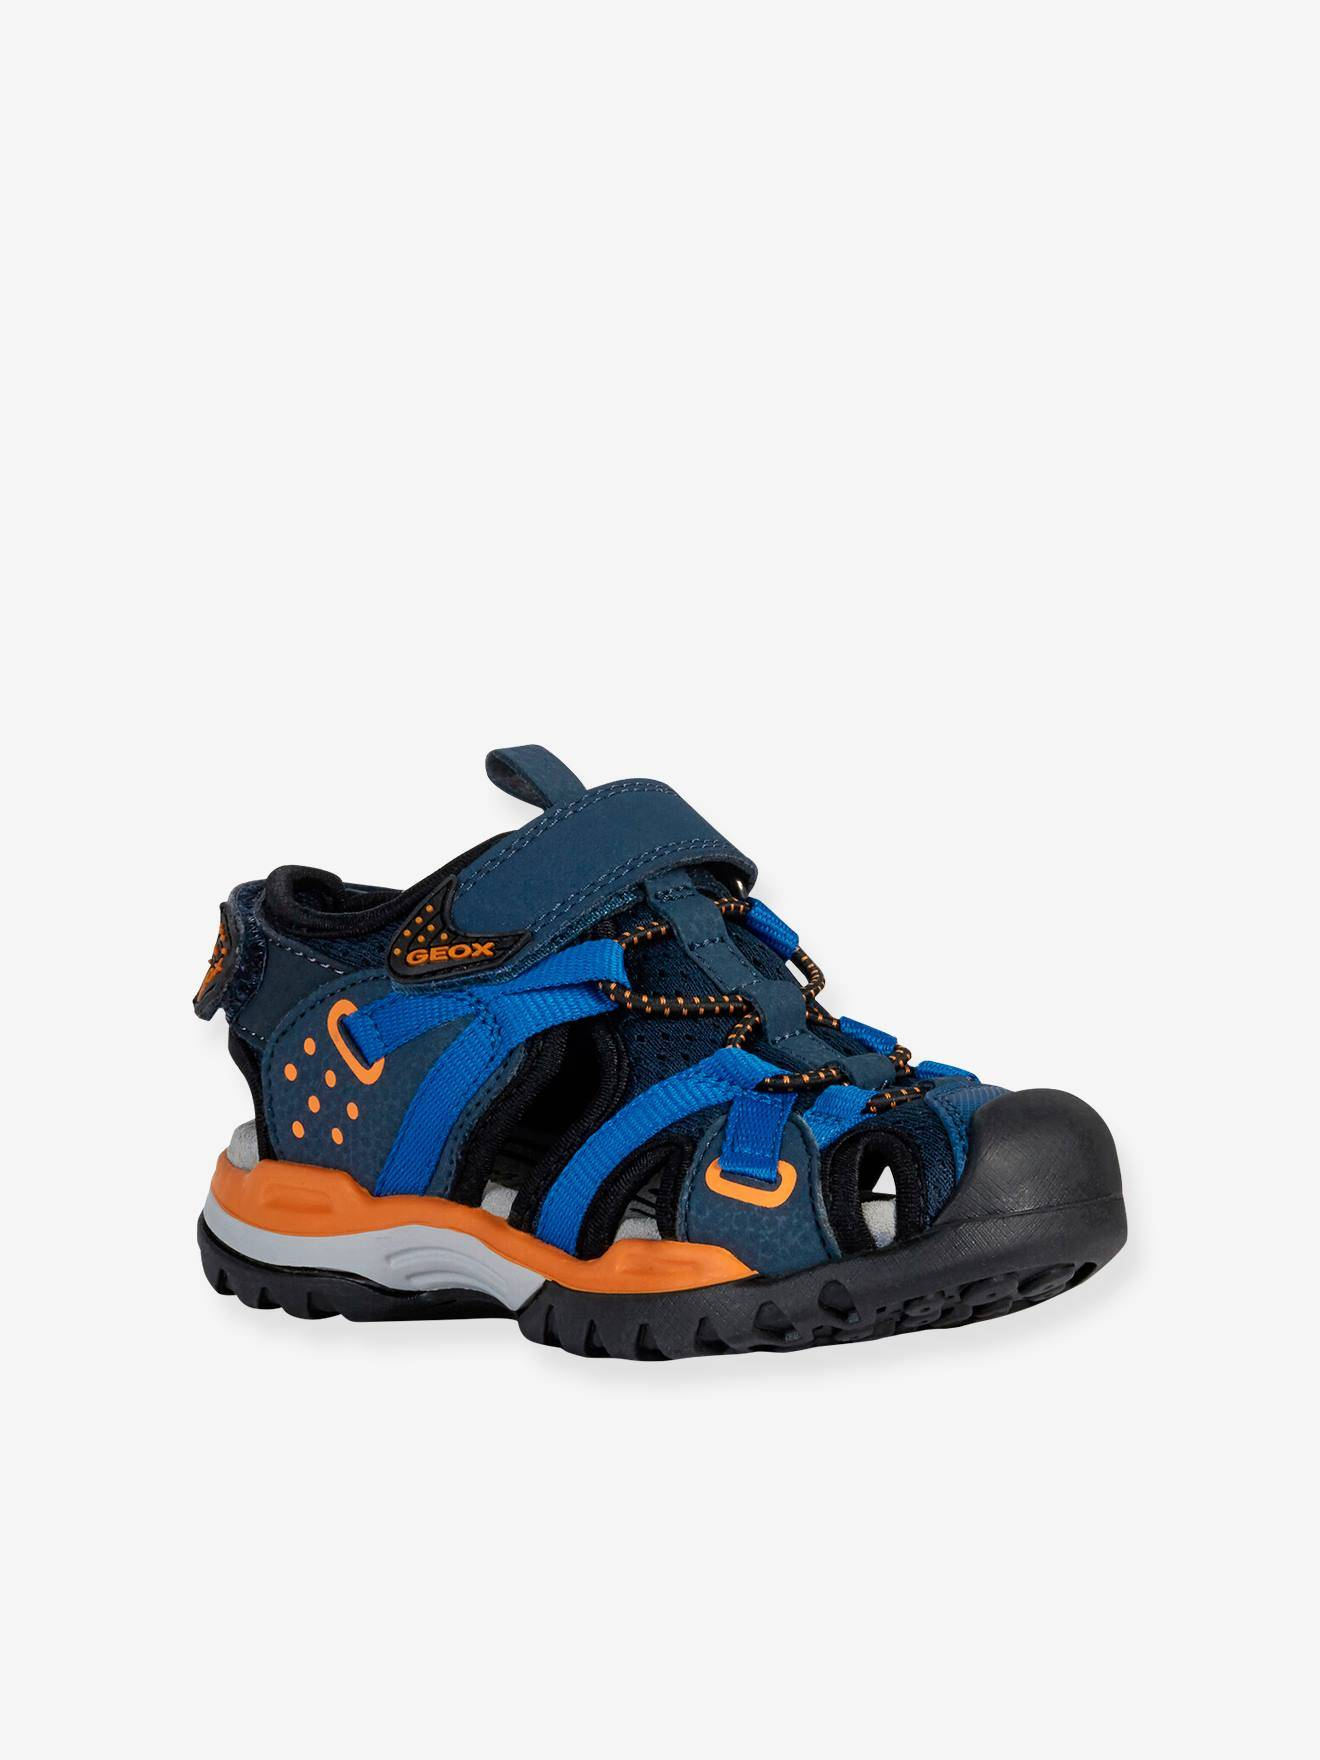 Geox Sandales garçon Borealis Boy B GEOX® bleu orange